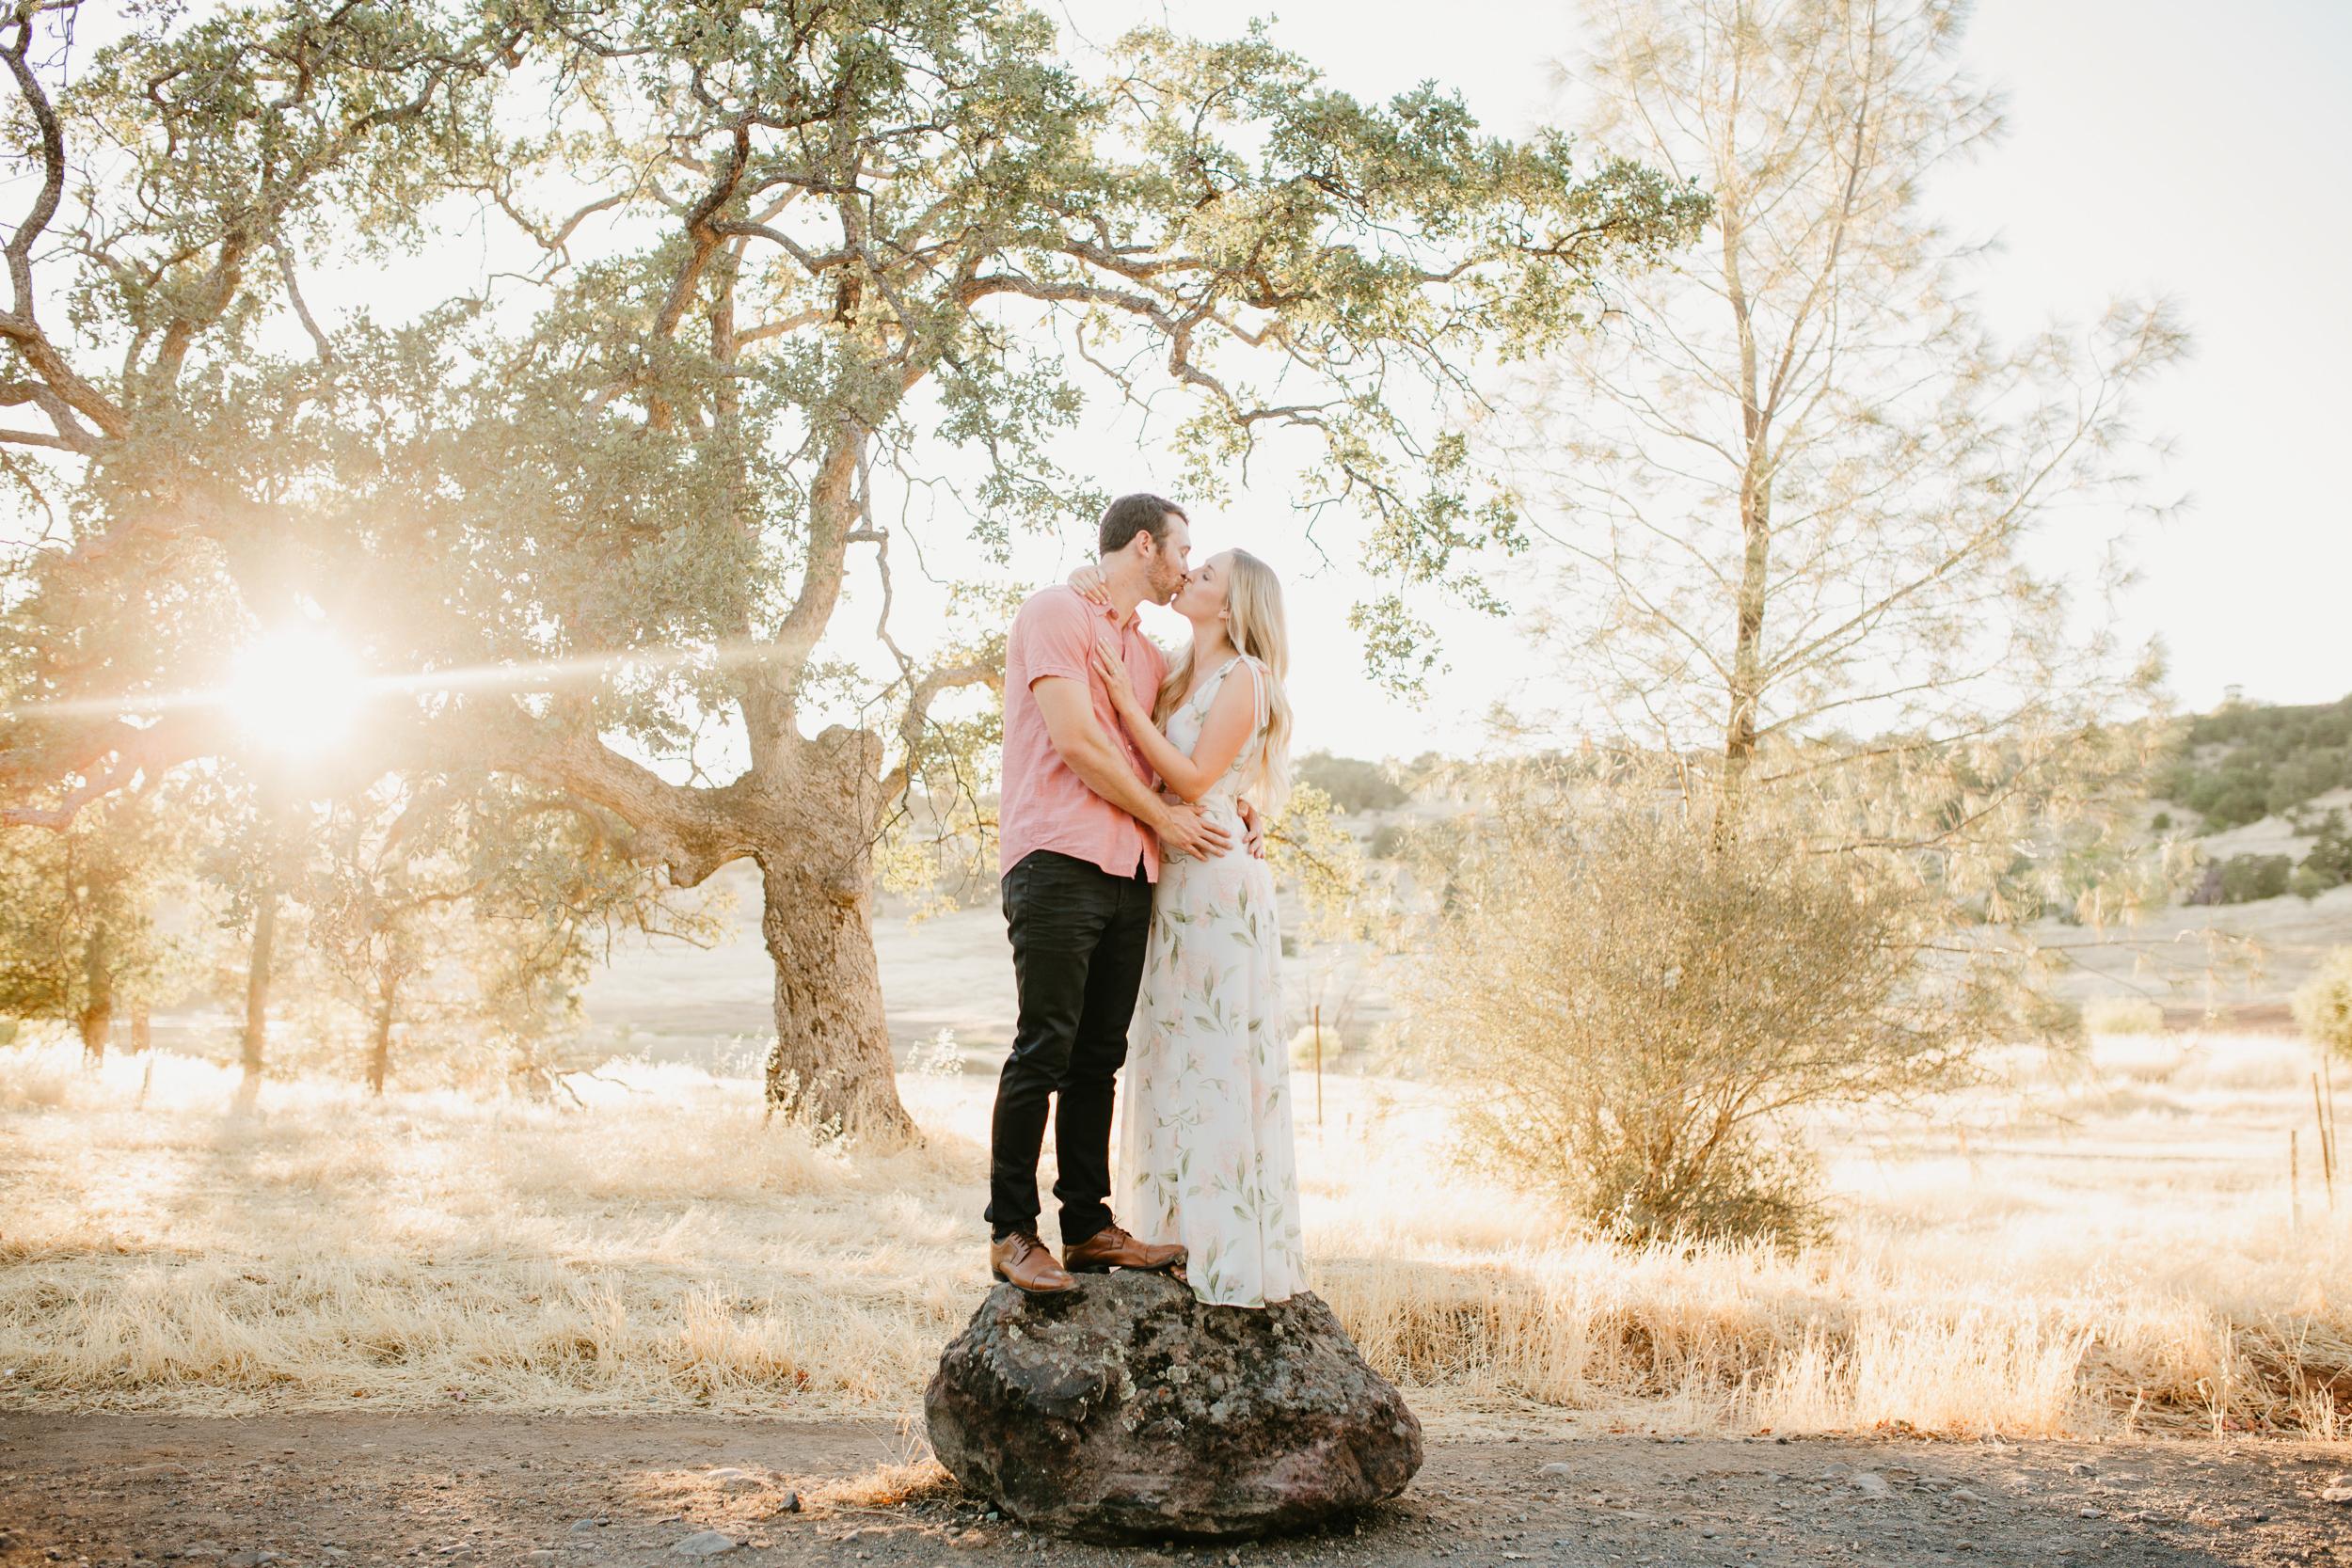 Engagement Photos-Ranalla Photo and Films-88.jpg